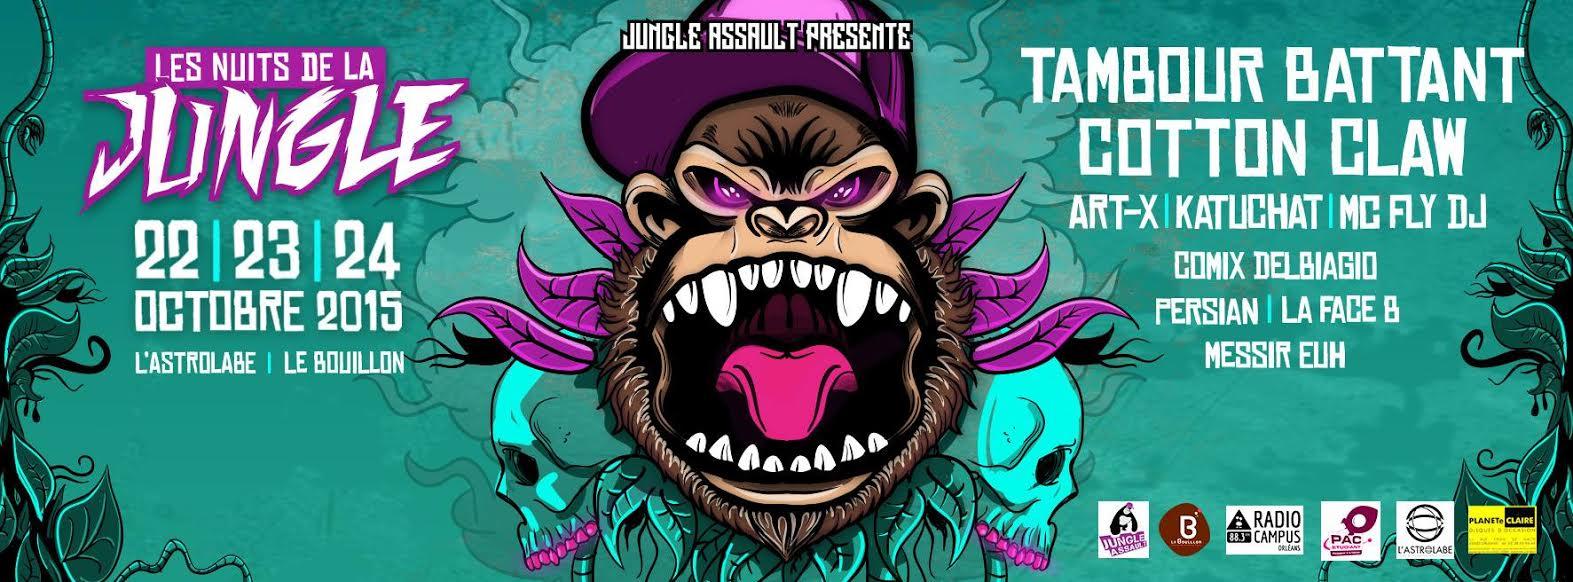 De jeudi à Samedi Jungle Assault présente, Les Nuits de la Jungle 6